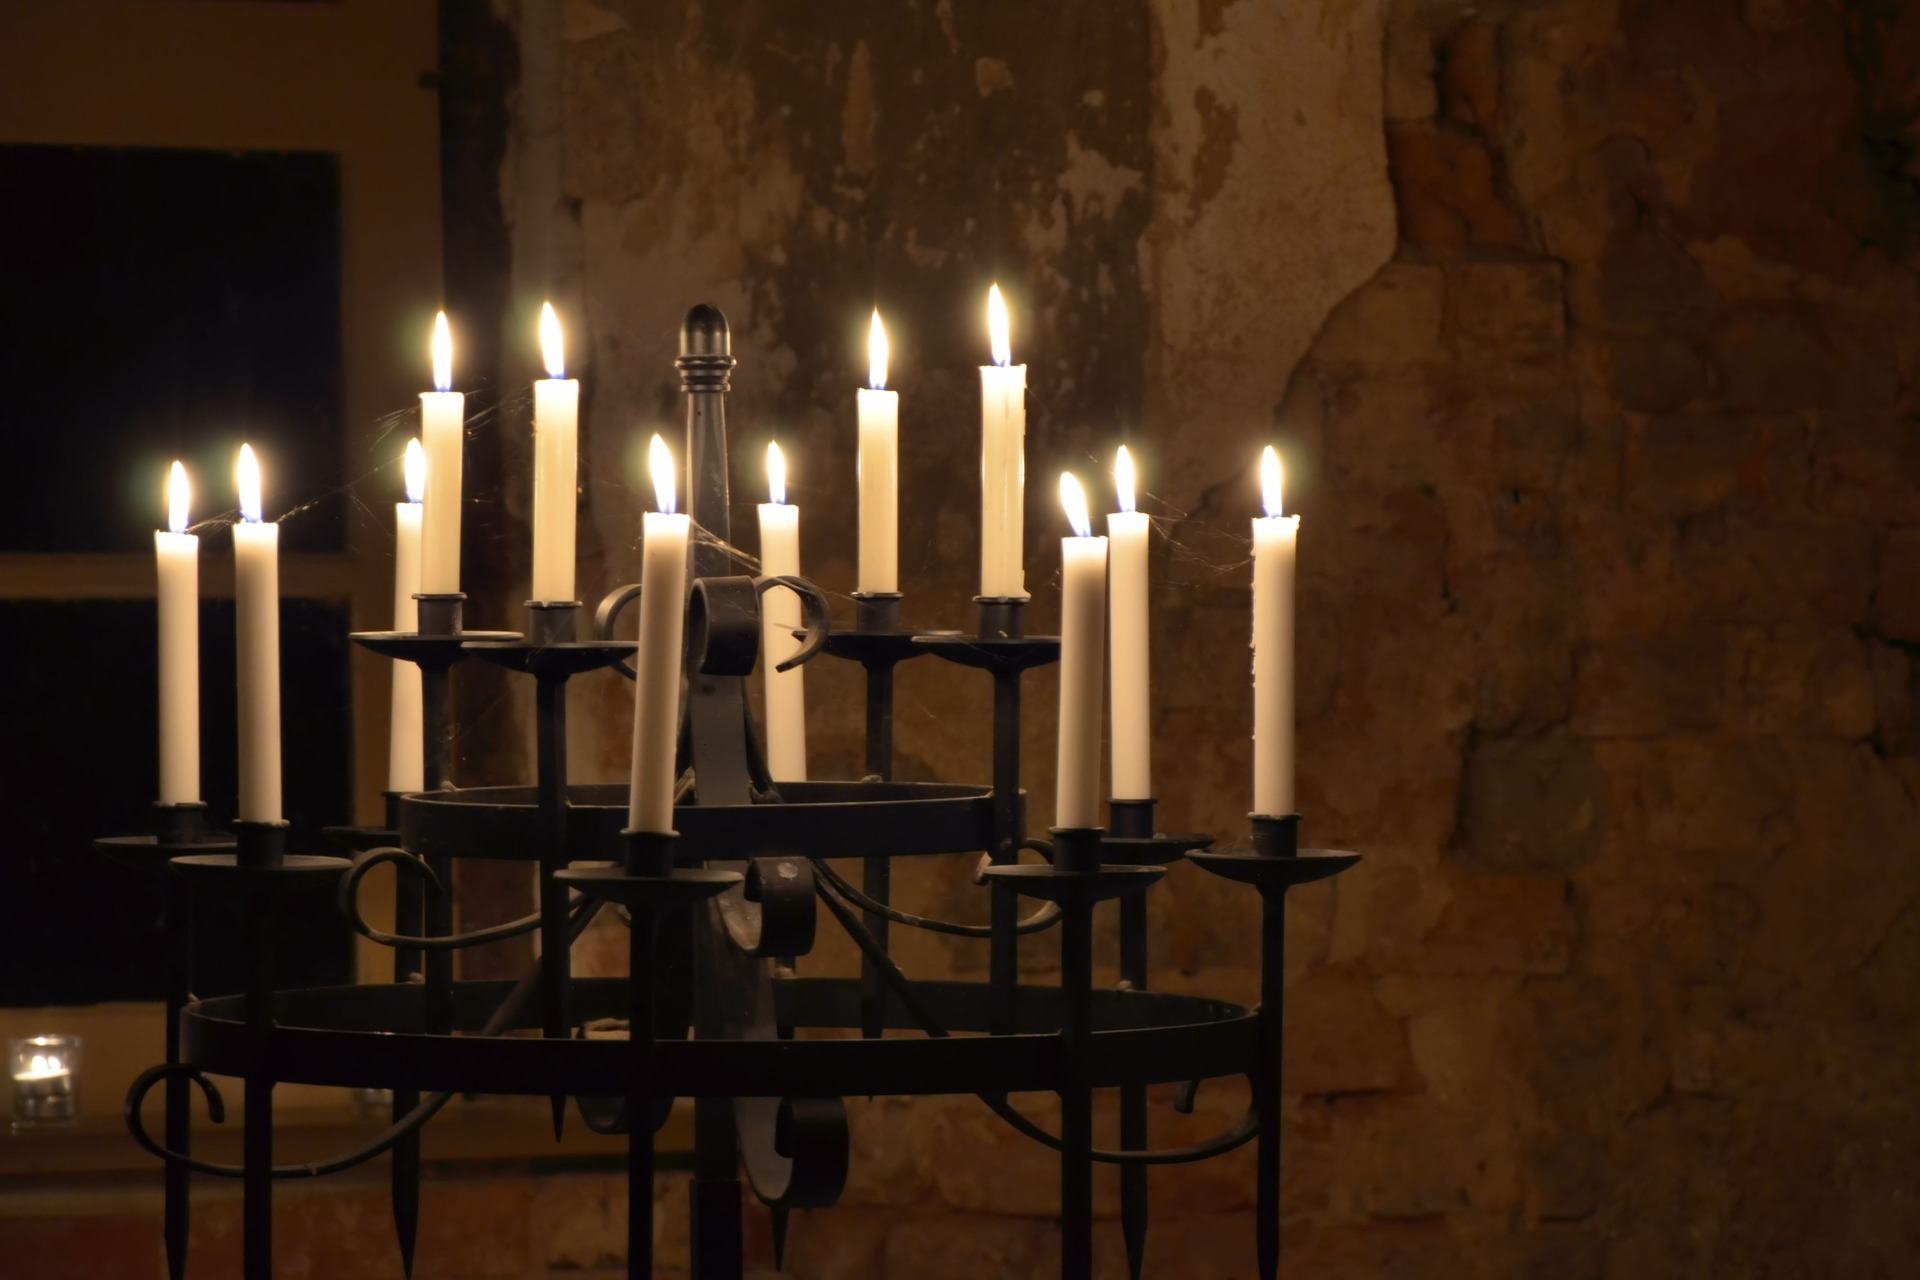 candlestick-1342415_1920